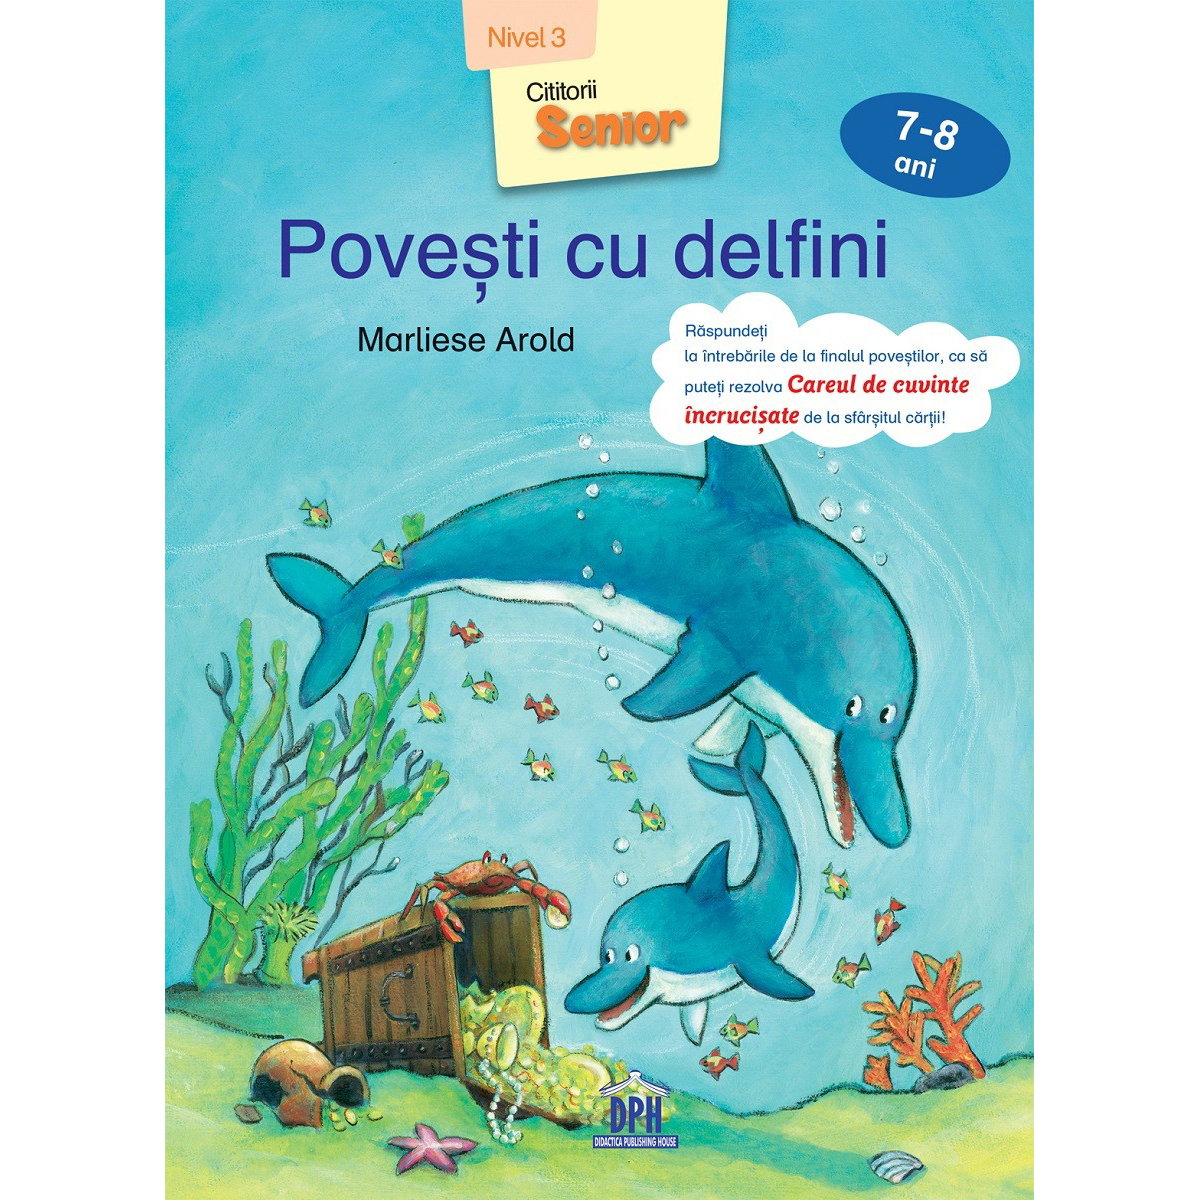 Carte Povesti cu delfini, nivel 3, 7-8 ani, Editura DPH